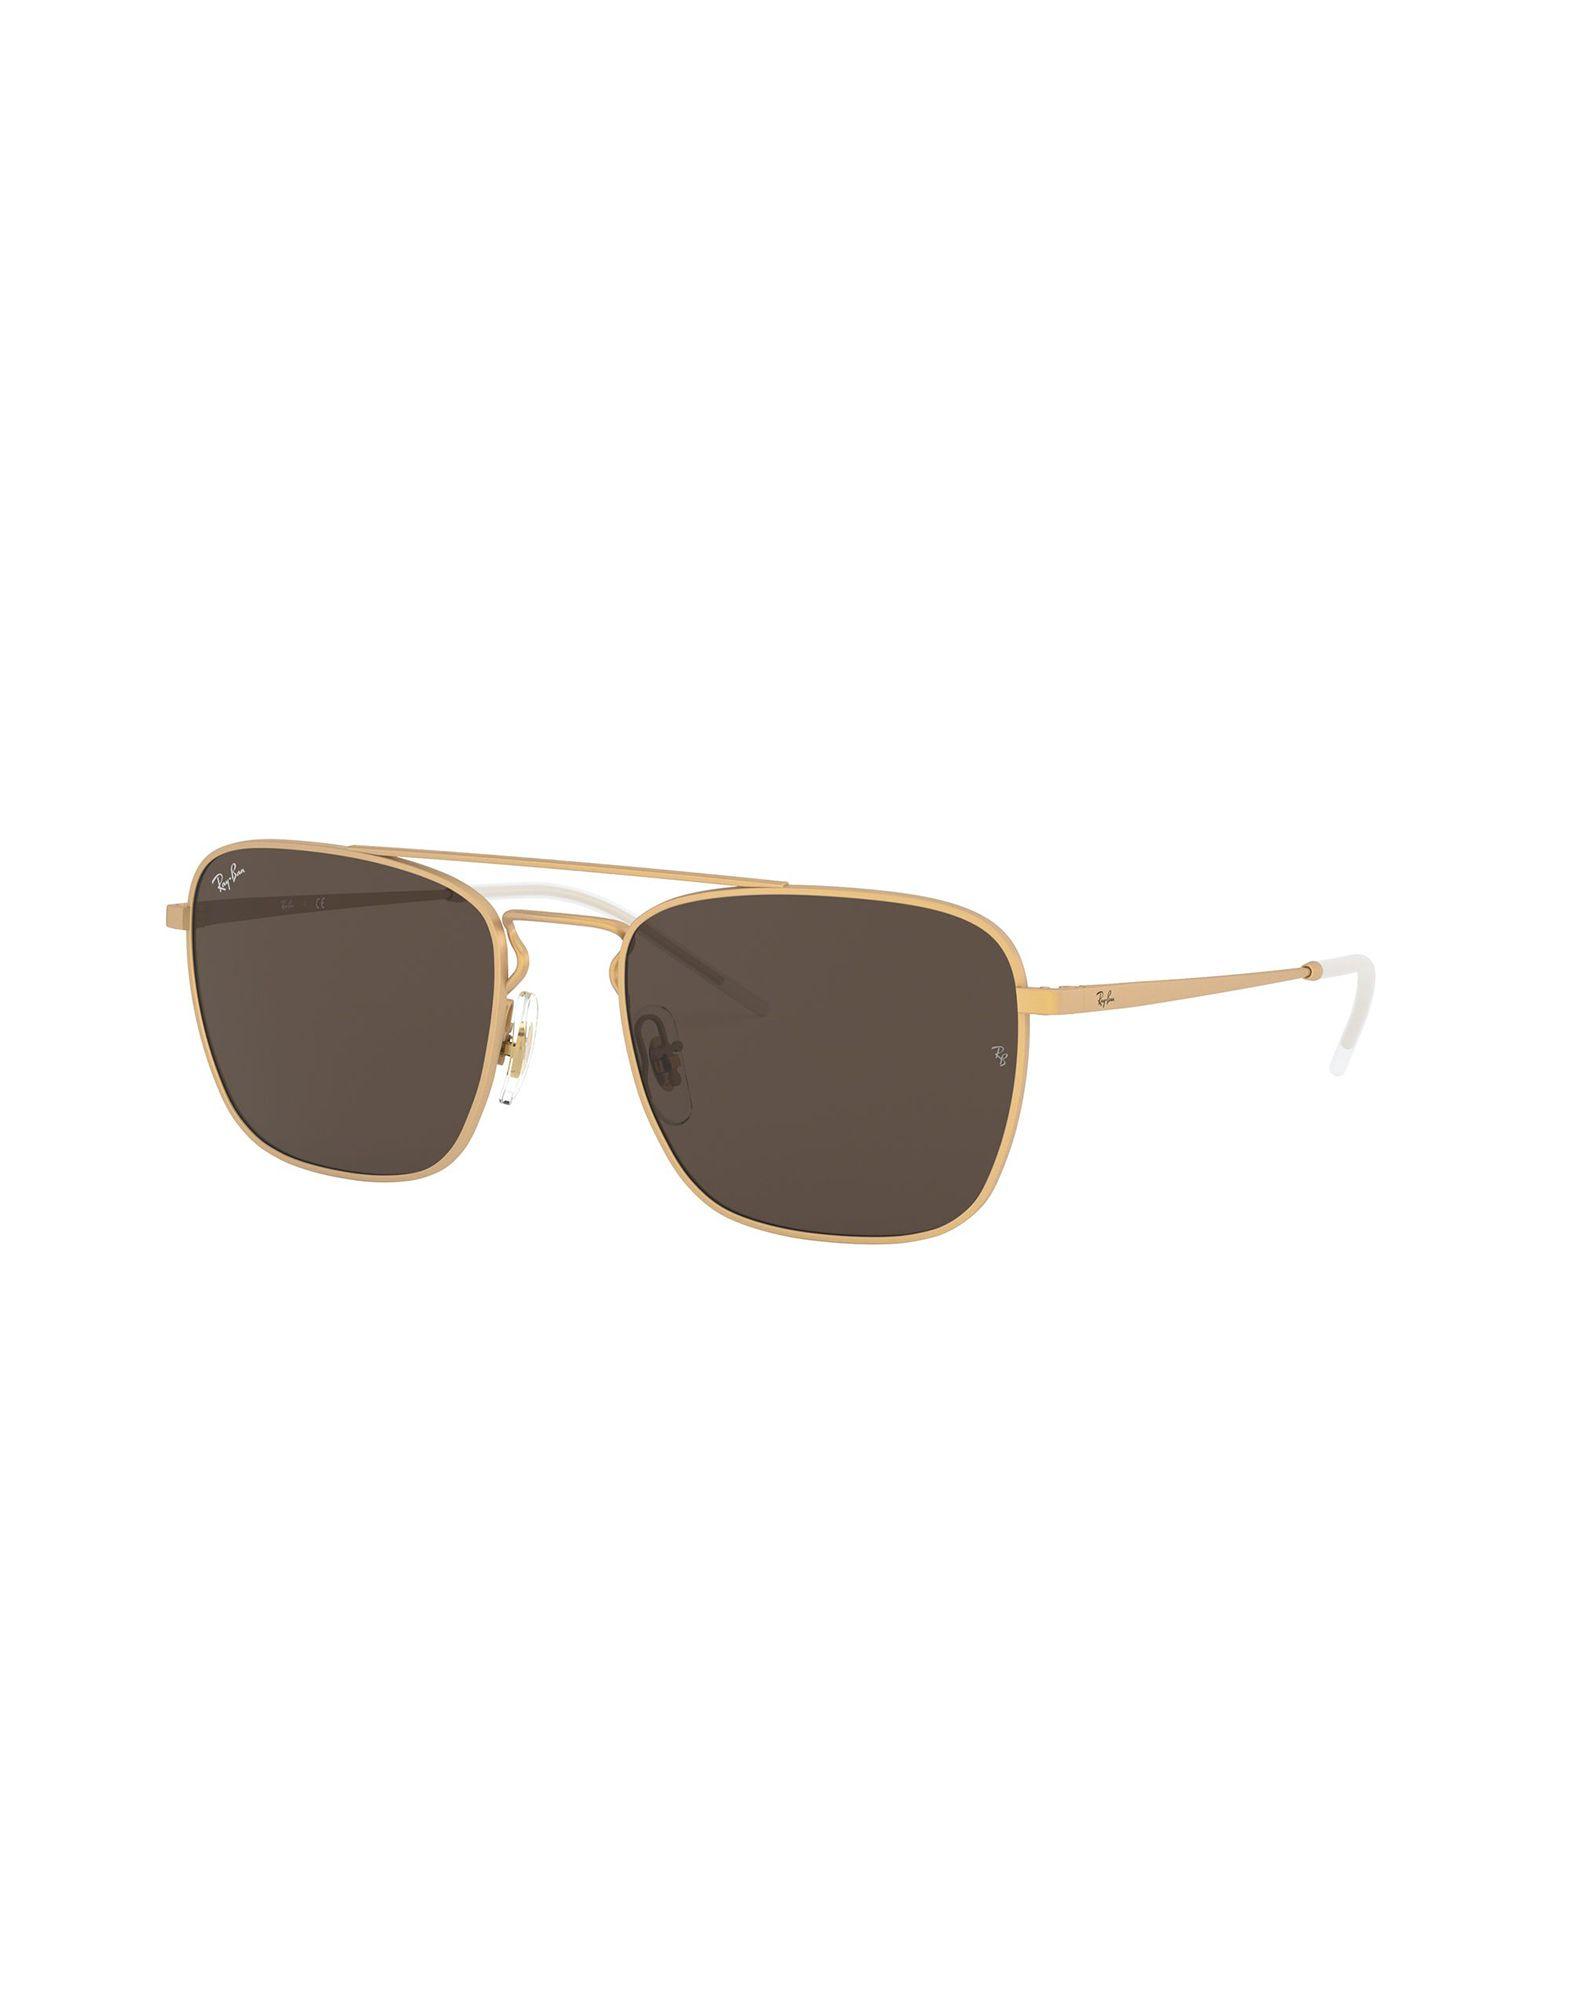 Фото - RAY-BAN Солнечные очки 3d очки